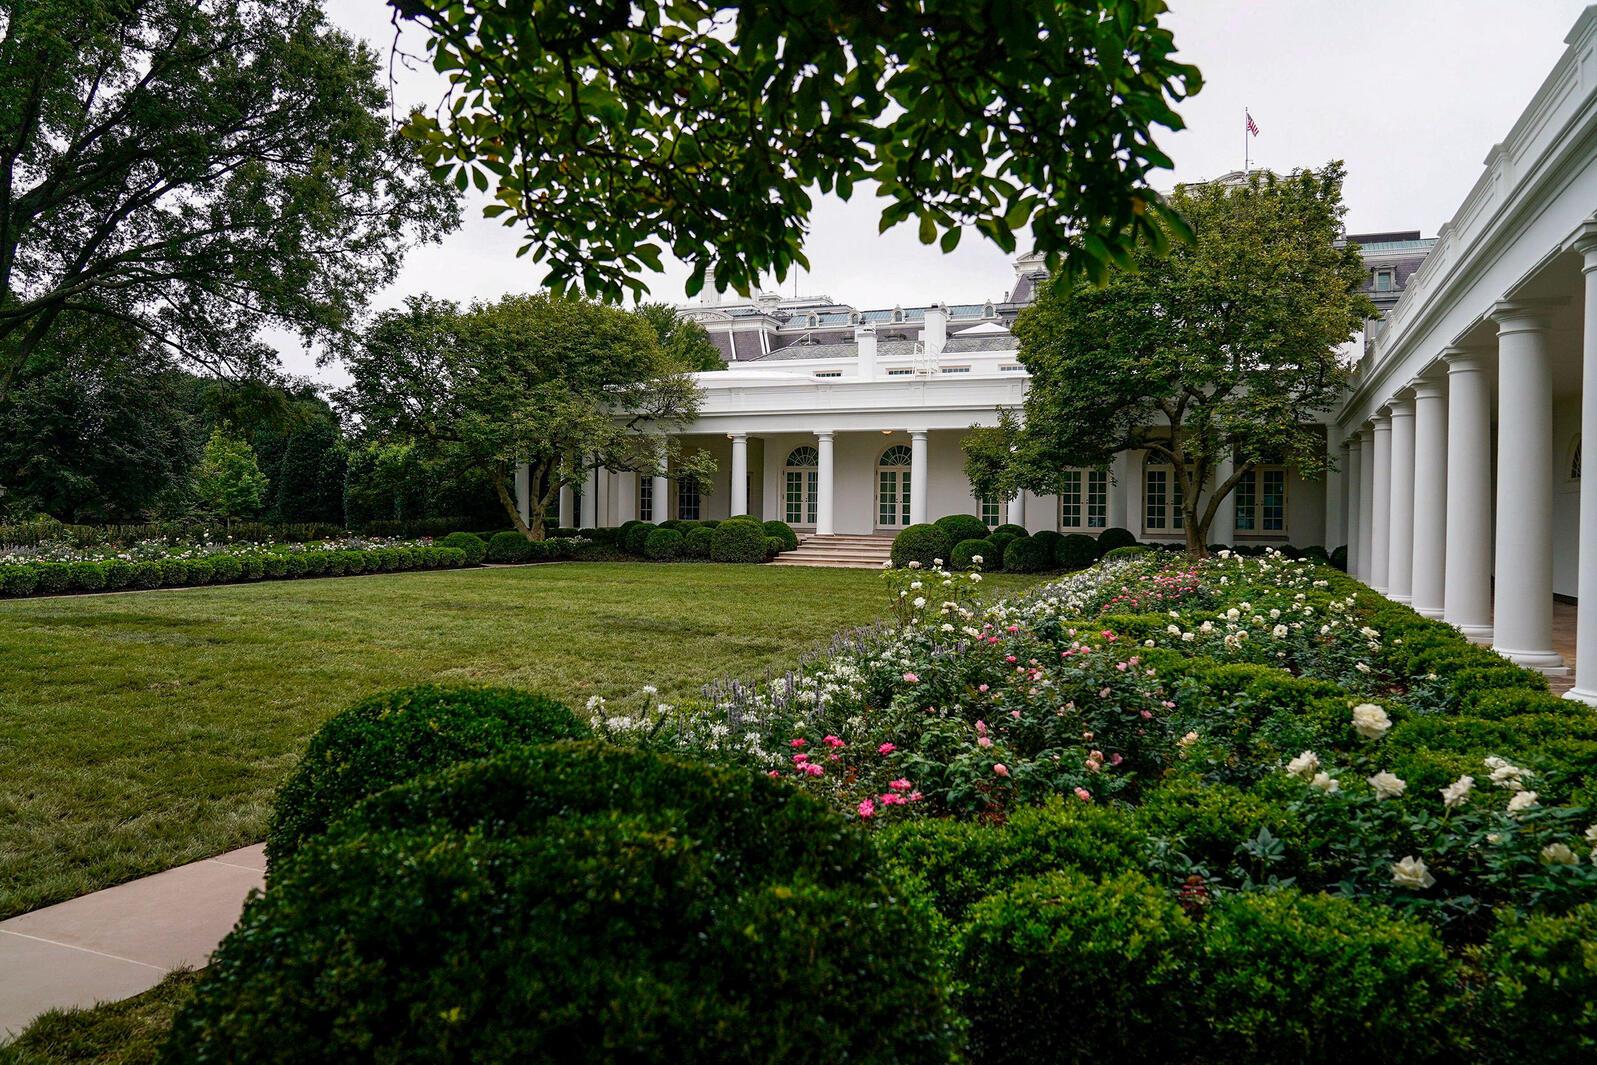 Newly renovated White House Rose Garden, Washington, D.C. August 2020. Erin Scott/Reuters/Alamy